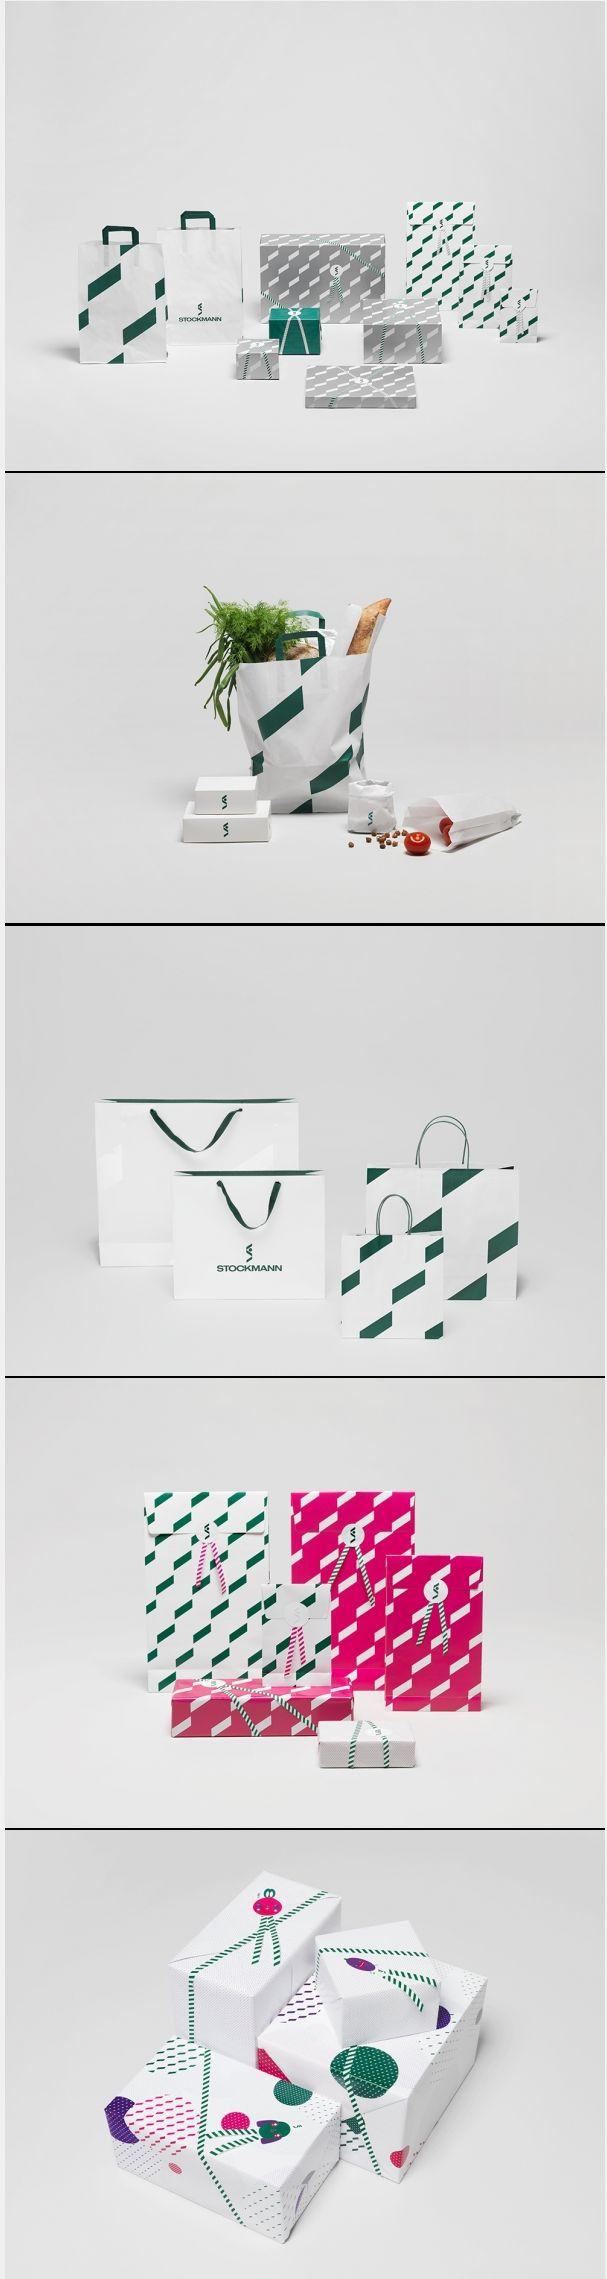 Stockmann Packaging